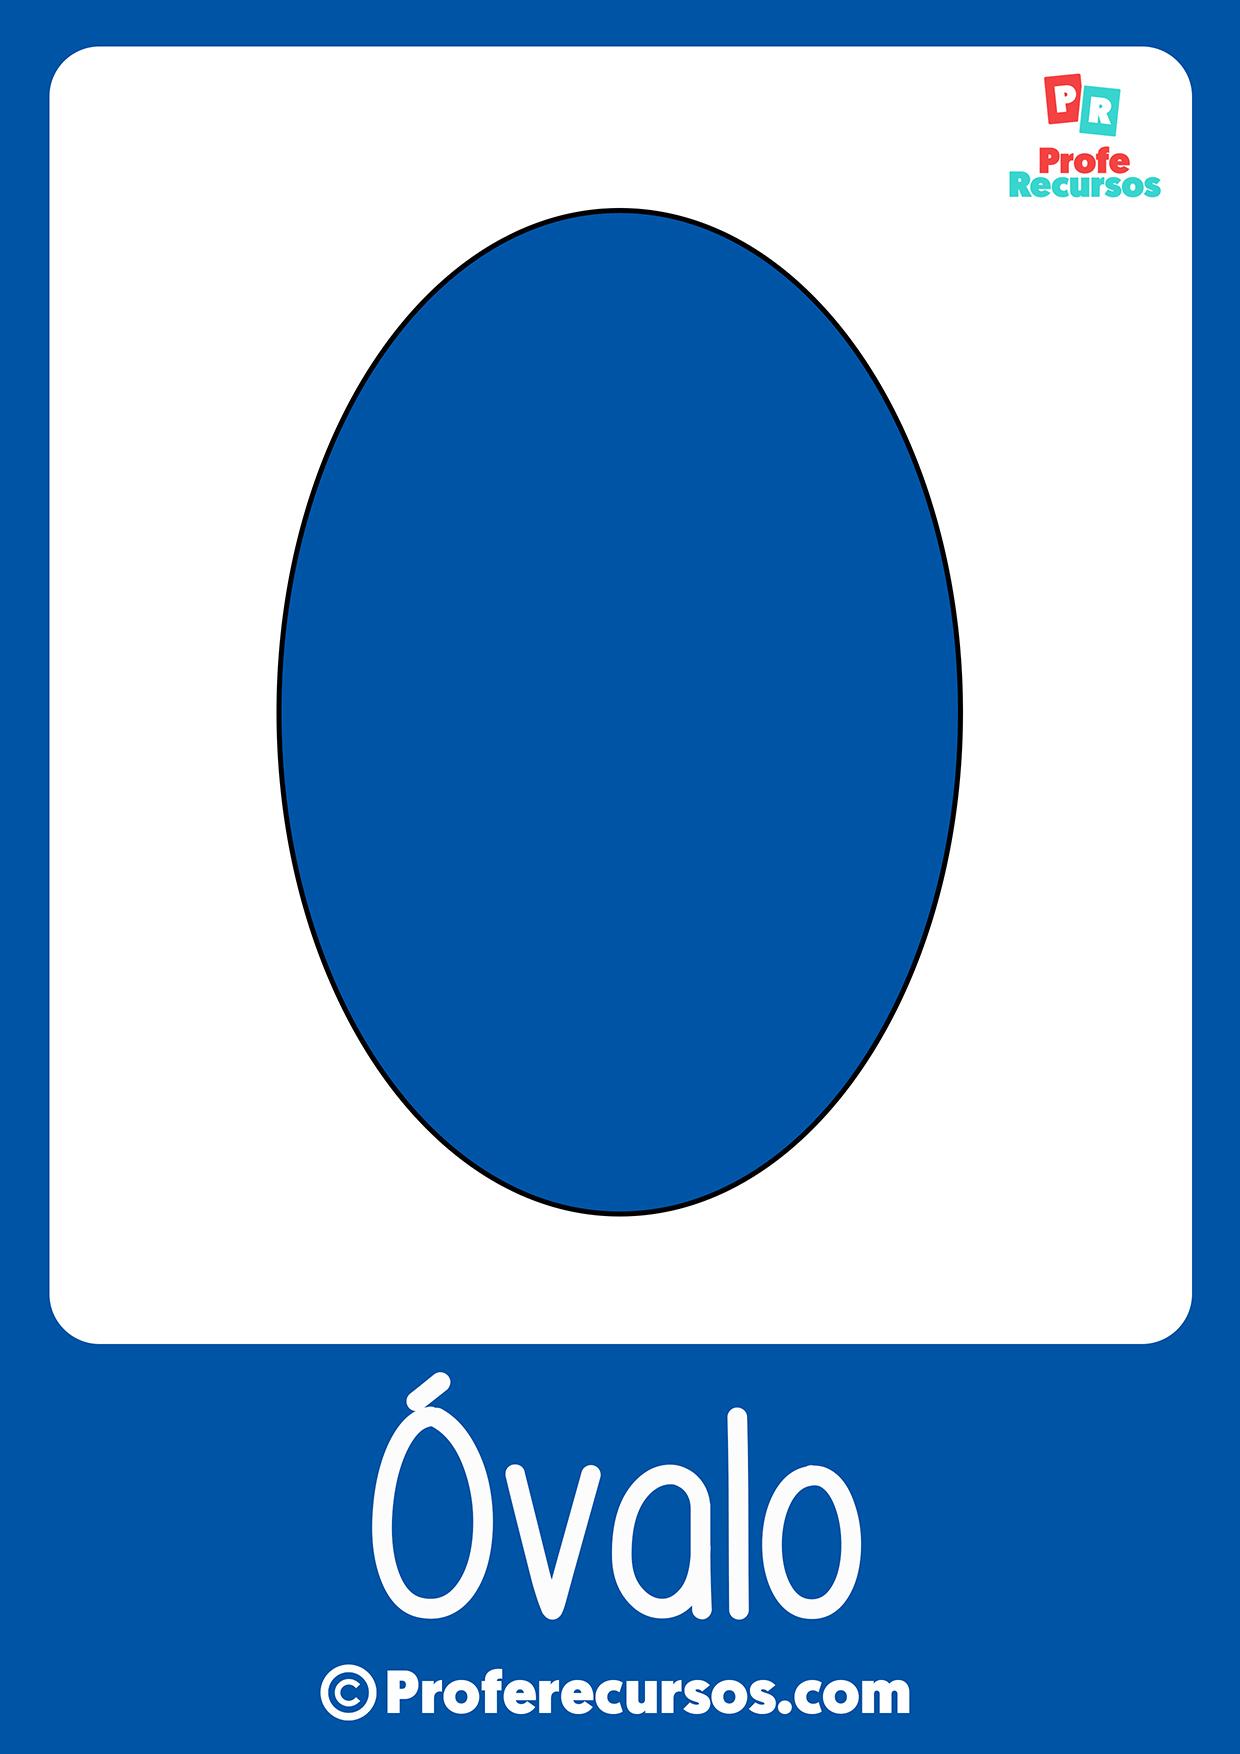 Figura ovalo - Profe Recursos